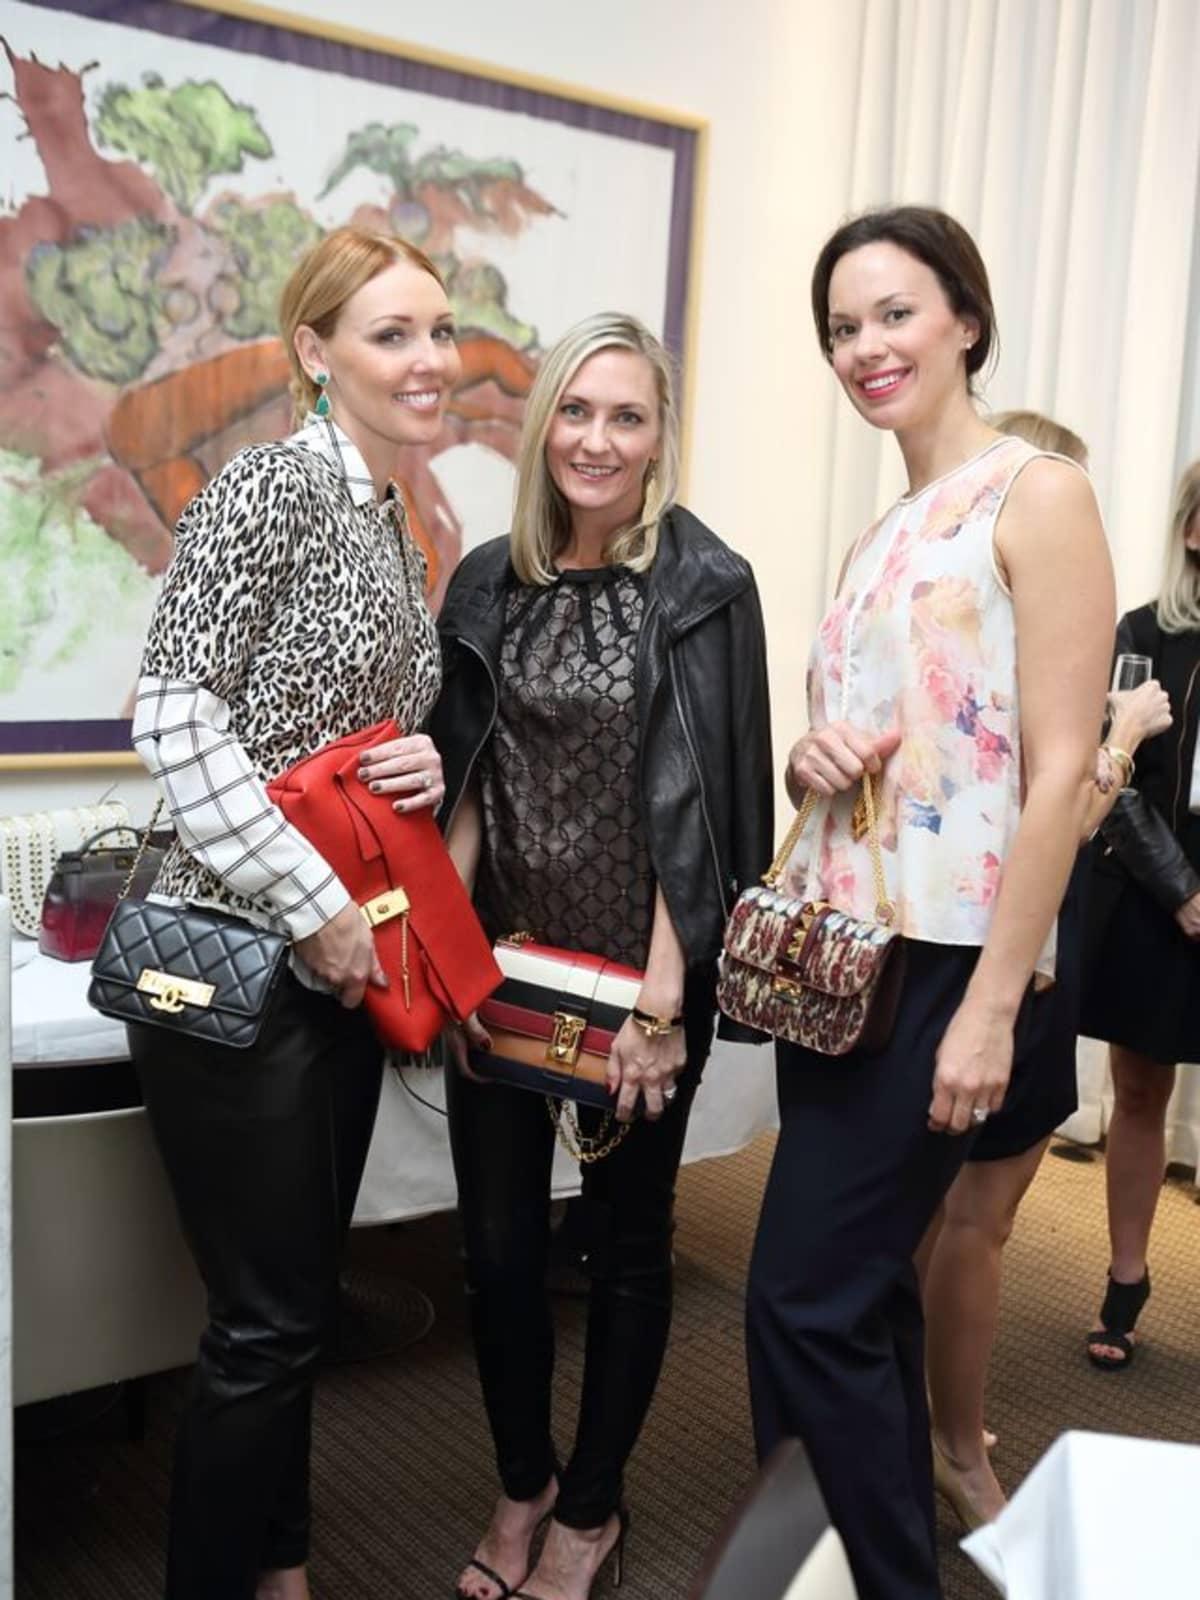 News, Shelby, Heroes & Handbags kick-off, Nov. 2015, Natalie King, Chandra Bonine, Rachel Brown